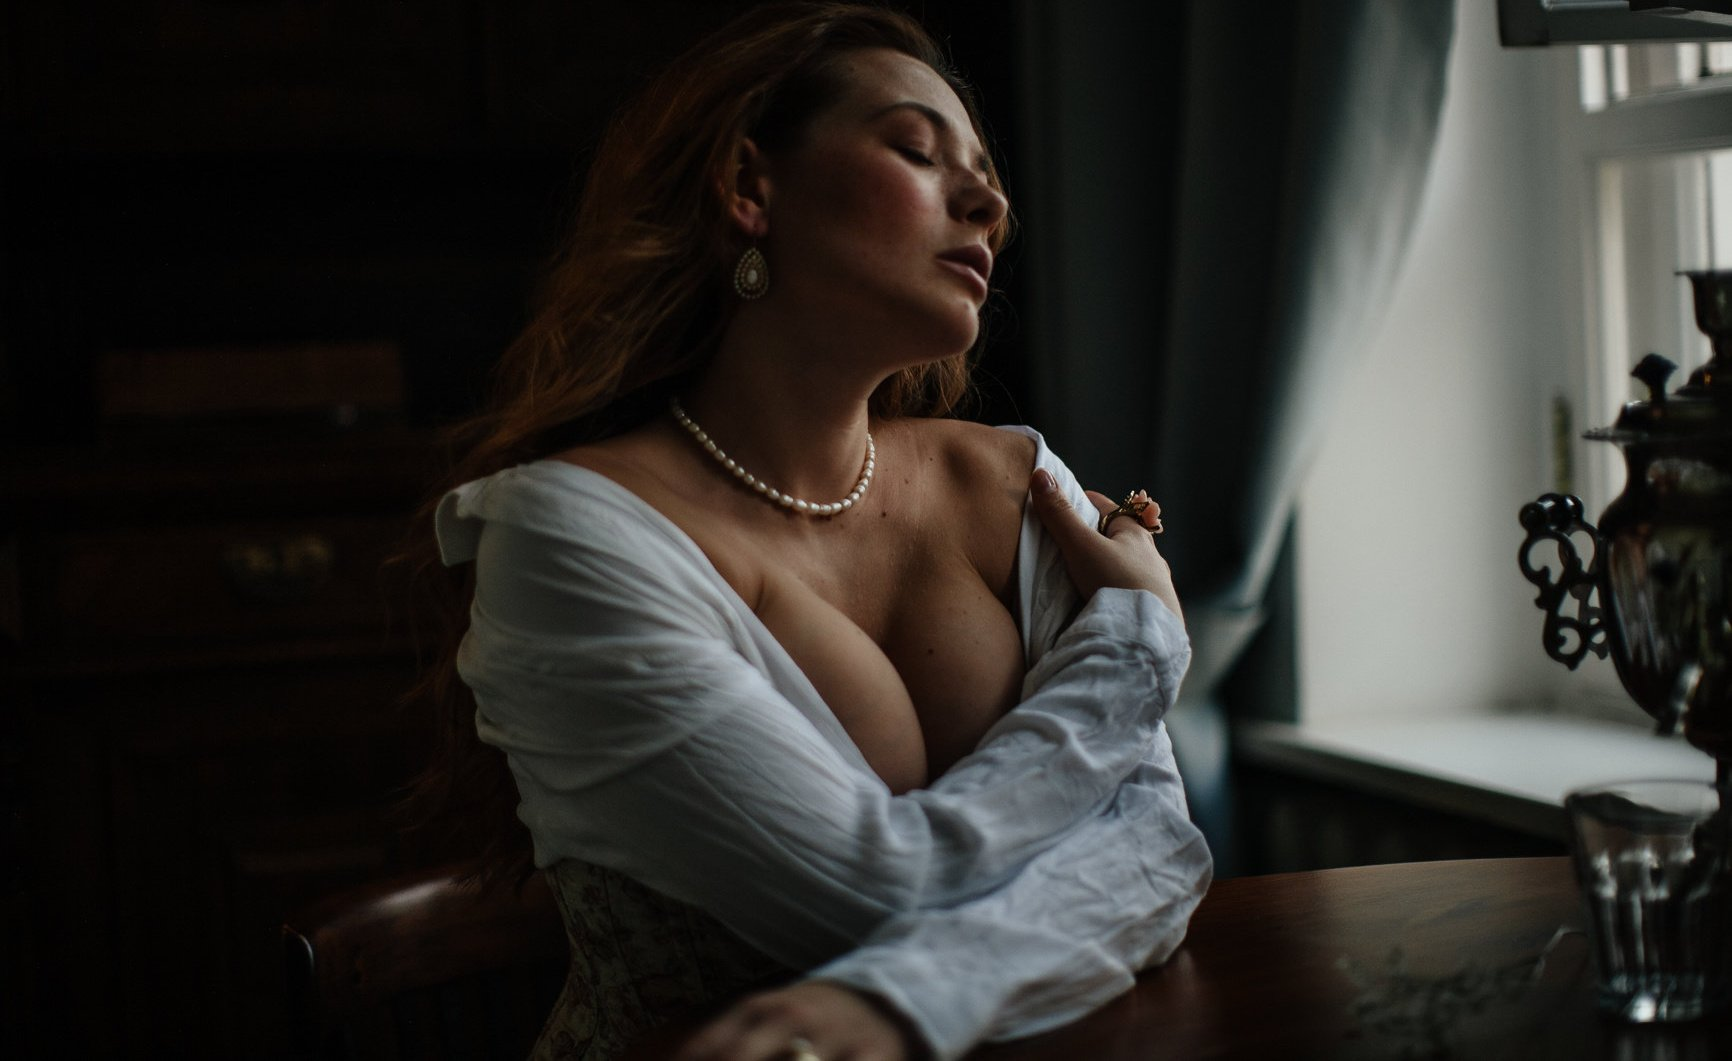 Olga Kobzar Bugs Bunny Gf Nudes Leaks 0007